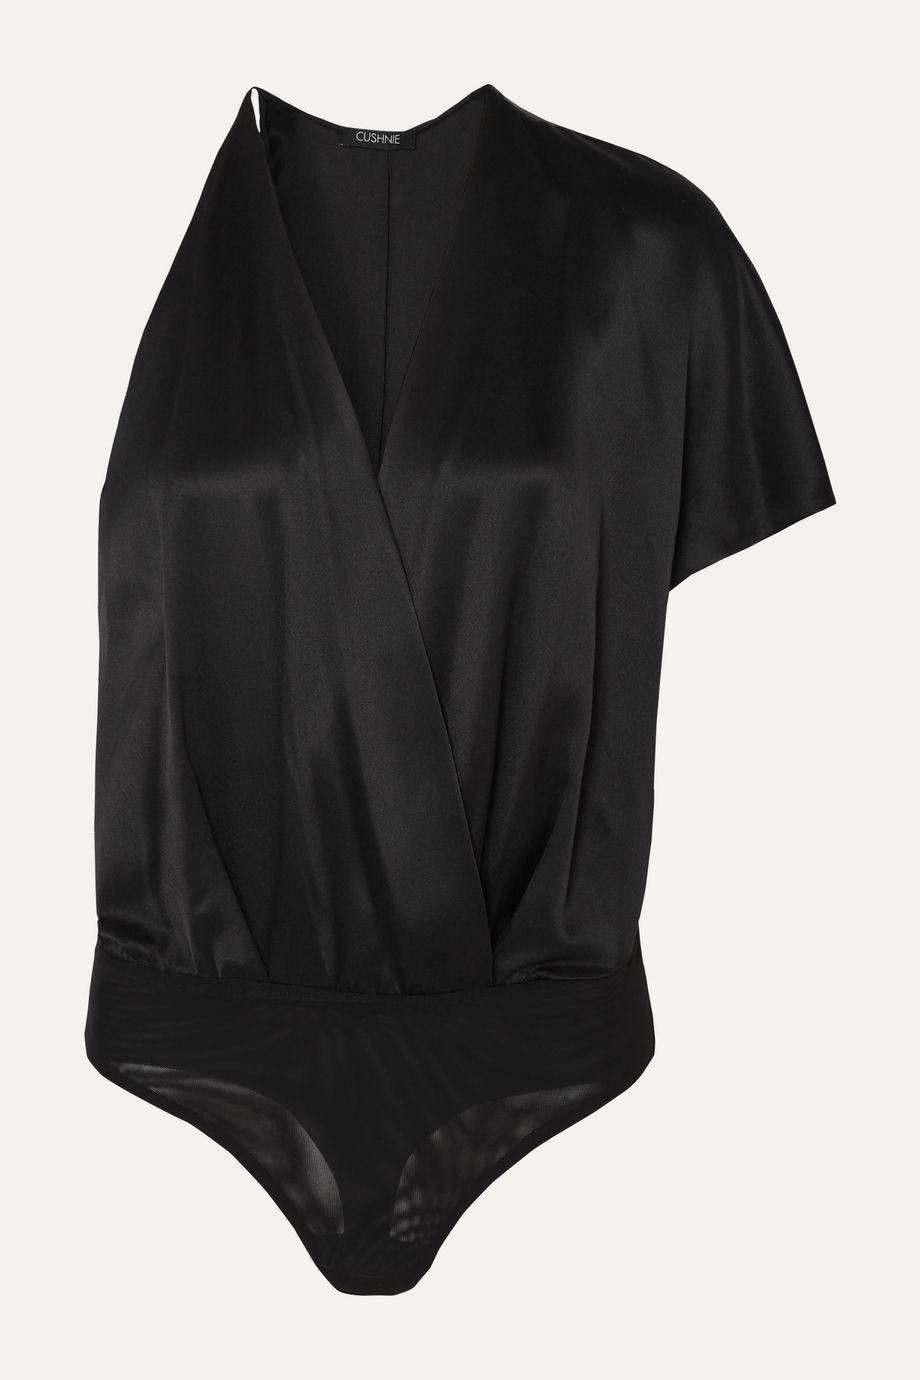 Cushnie One-sleeve wrap-effect silk-charmeuse bodysuit